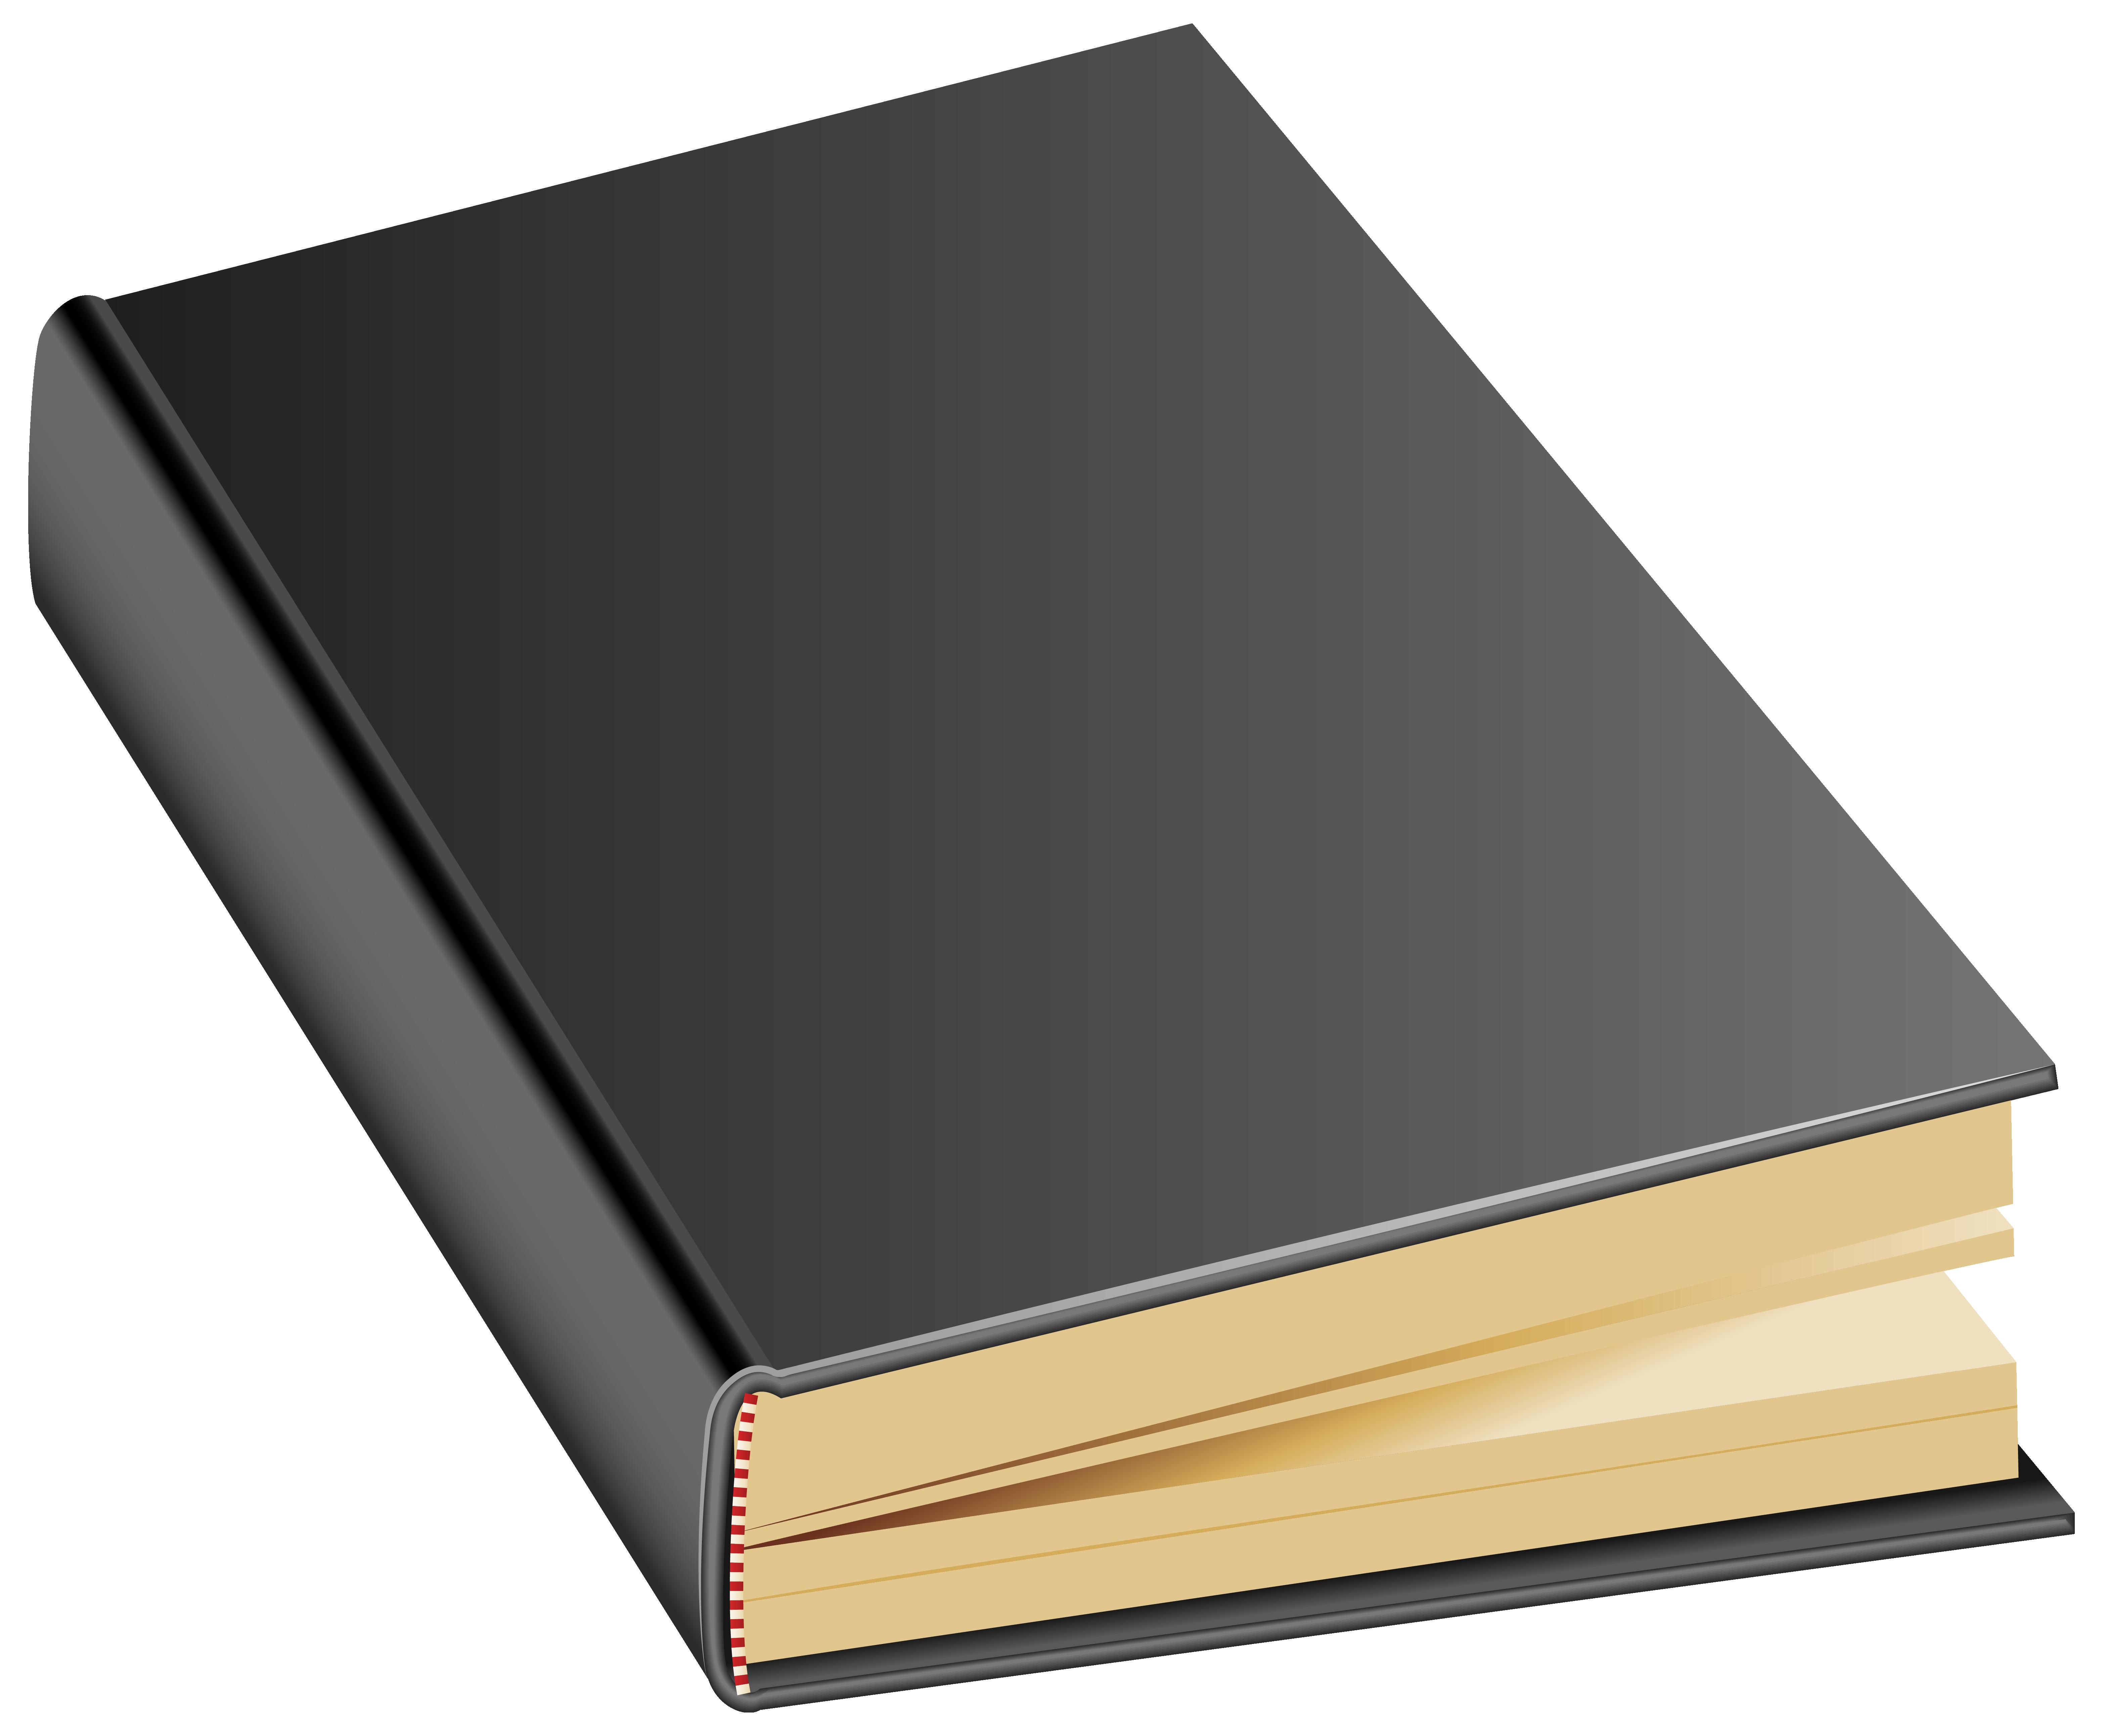 Black Book PNG Clipart.